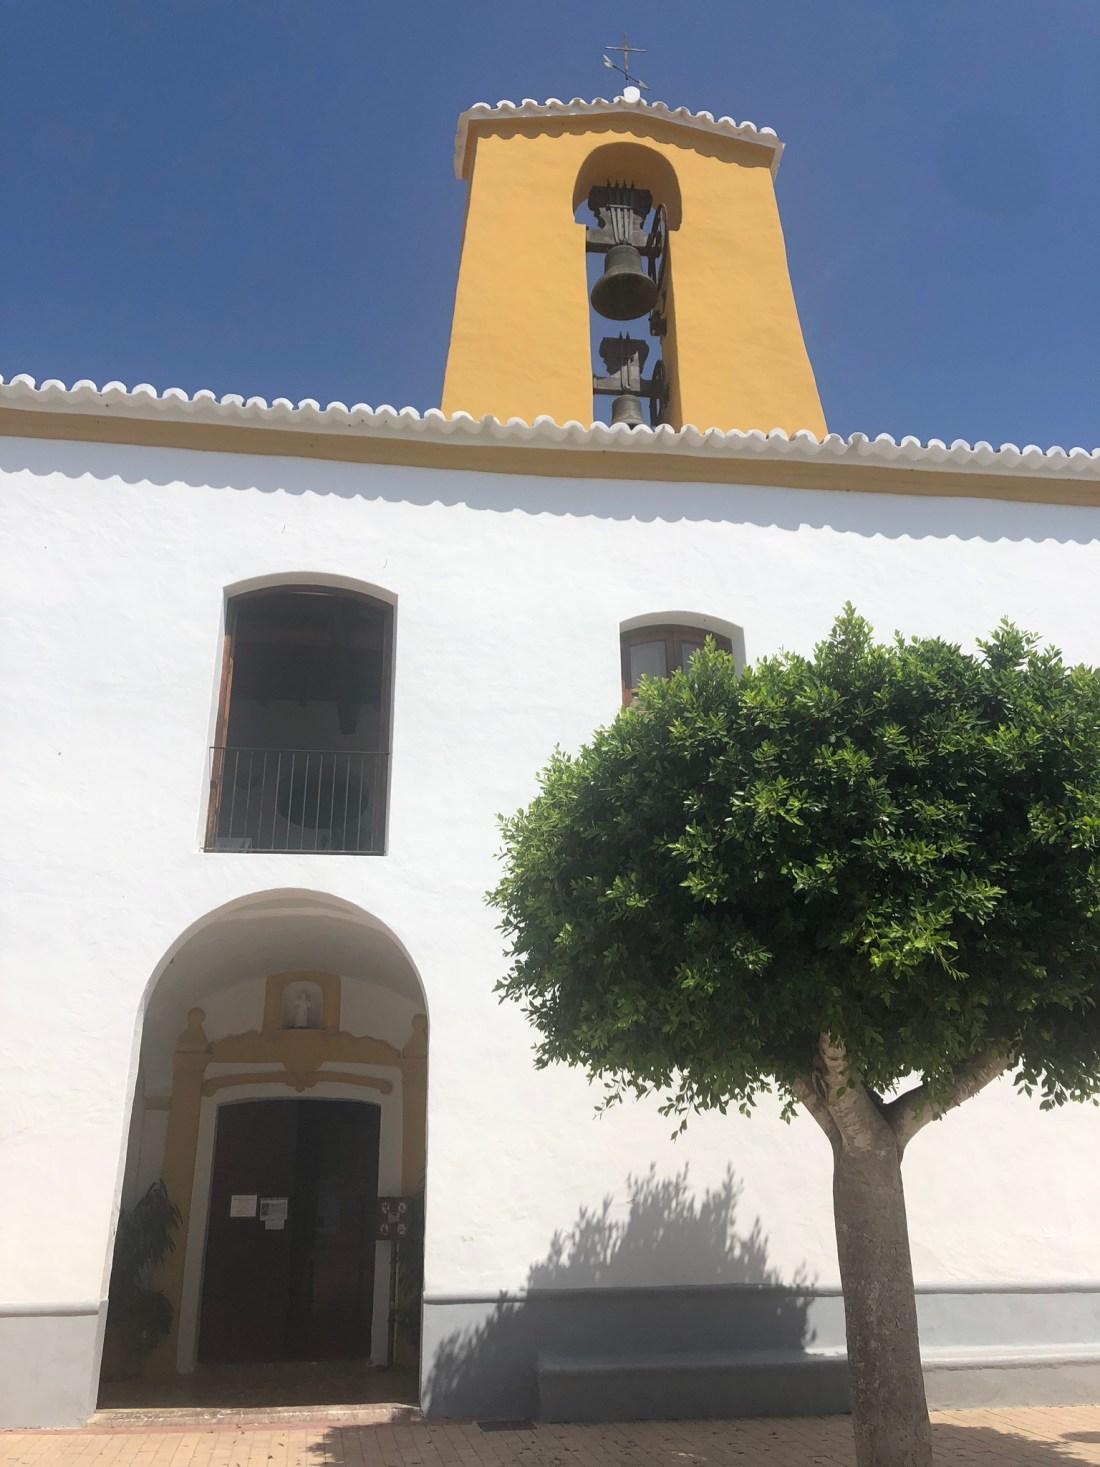 Best places to visit in Ibiza: Church in Santa Gertrudis, Ibiza